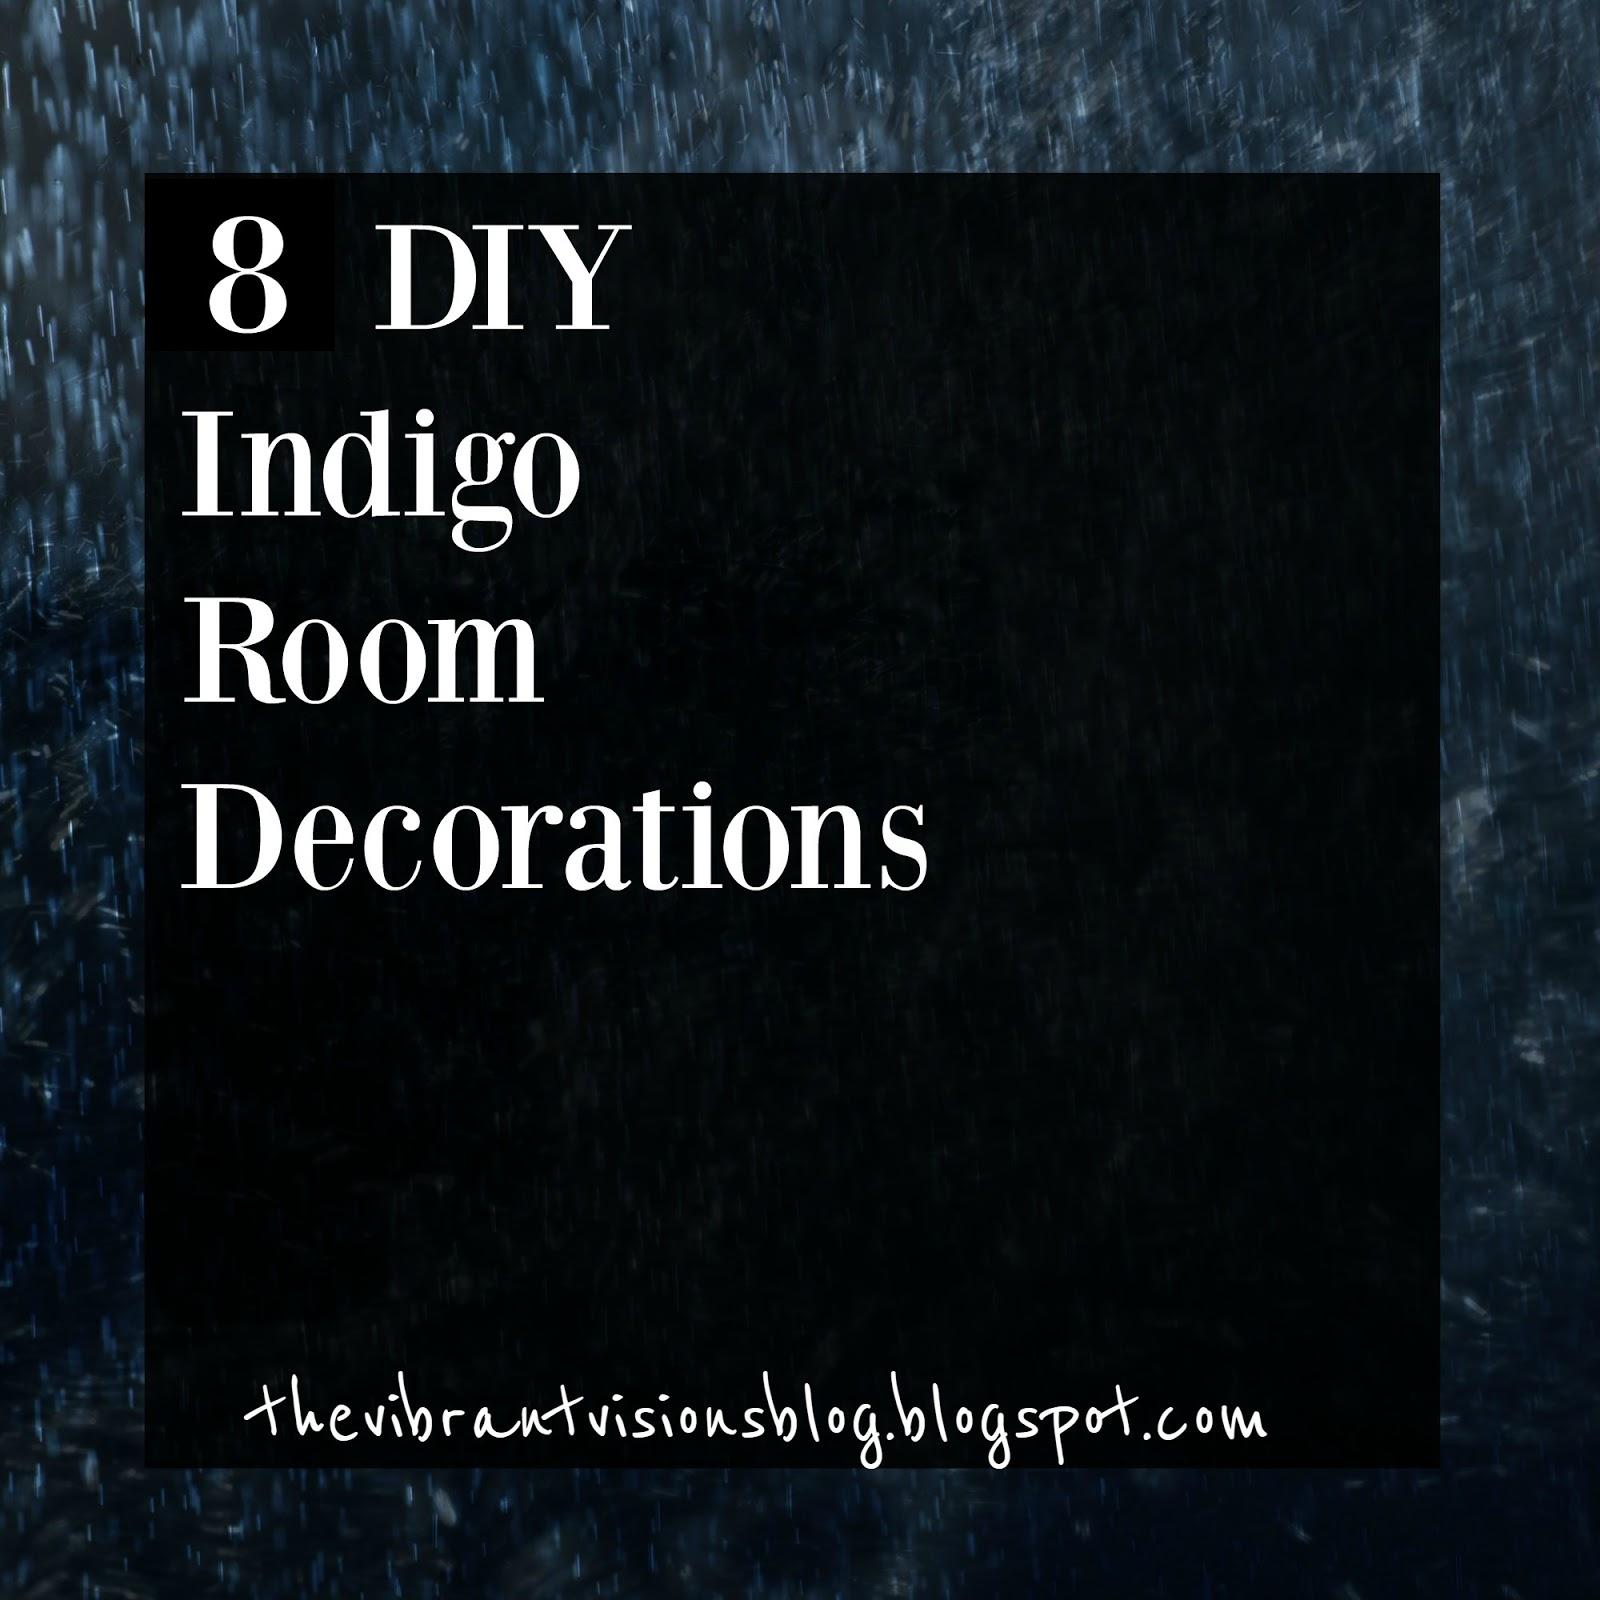 Derrick Jamie Bohemian Garden Wedding 19: The Vibrant Visions Blog: 8 DIY Indigo Room Decorations